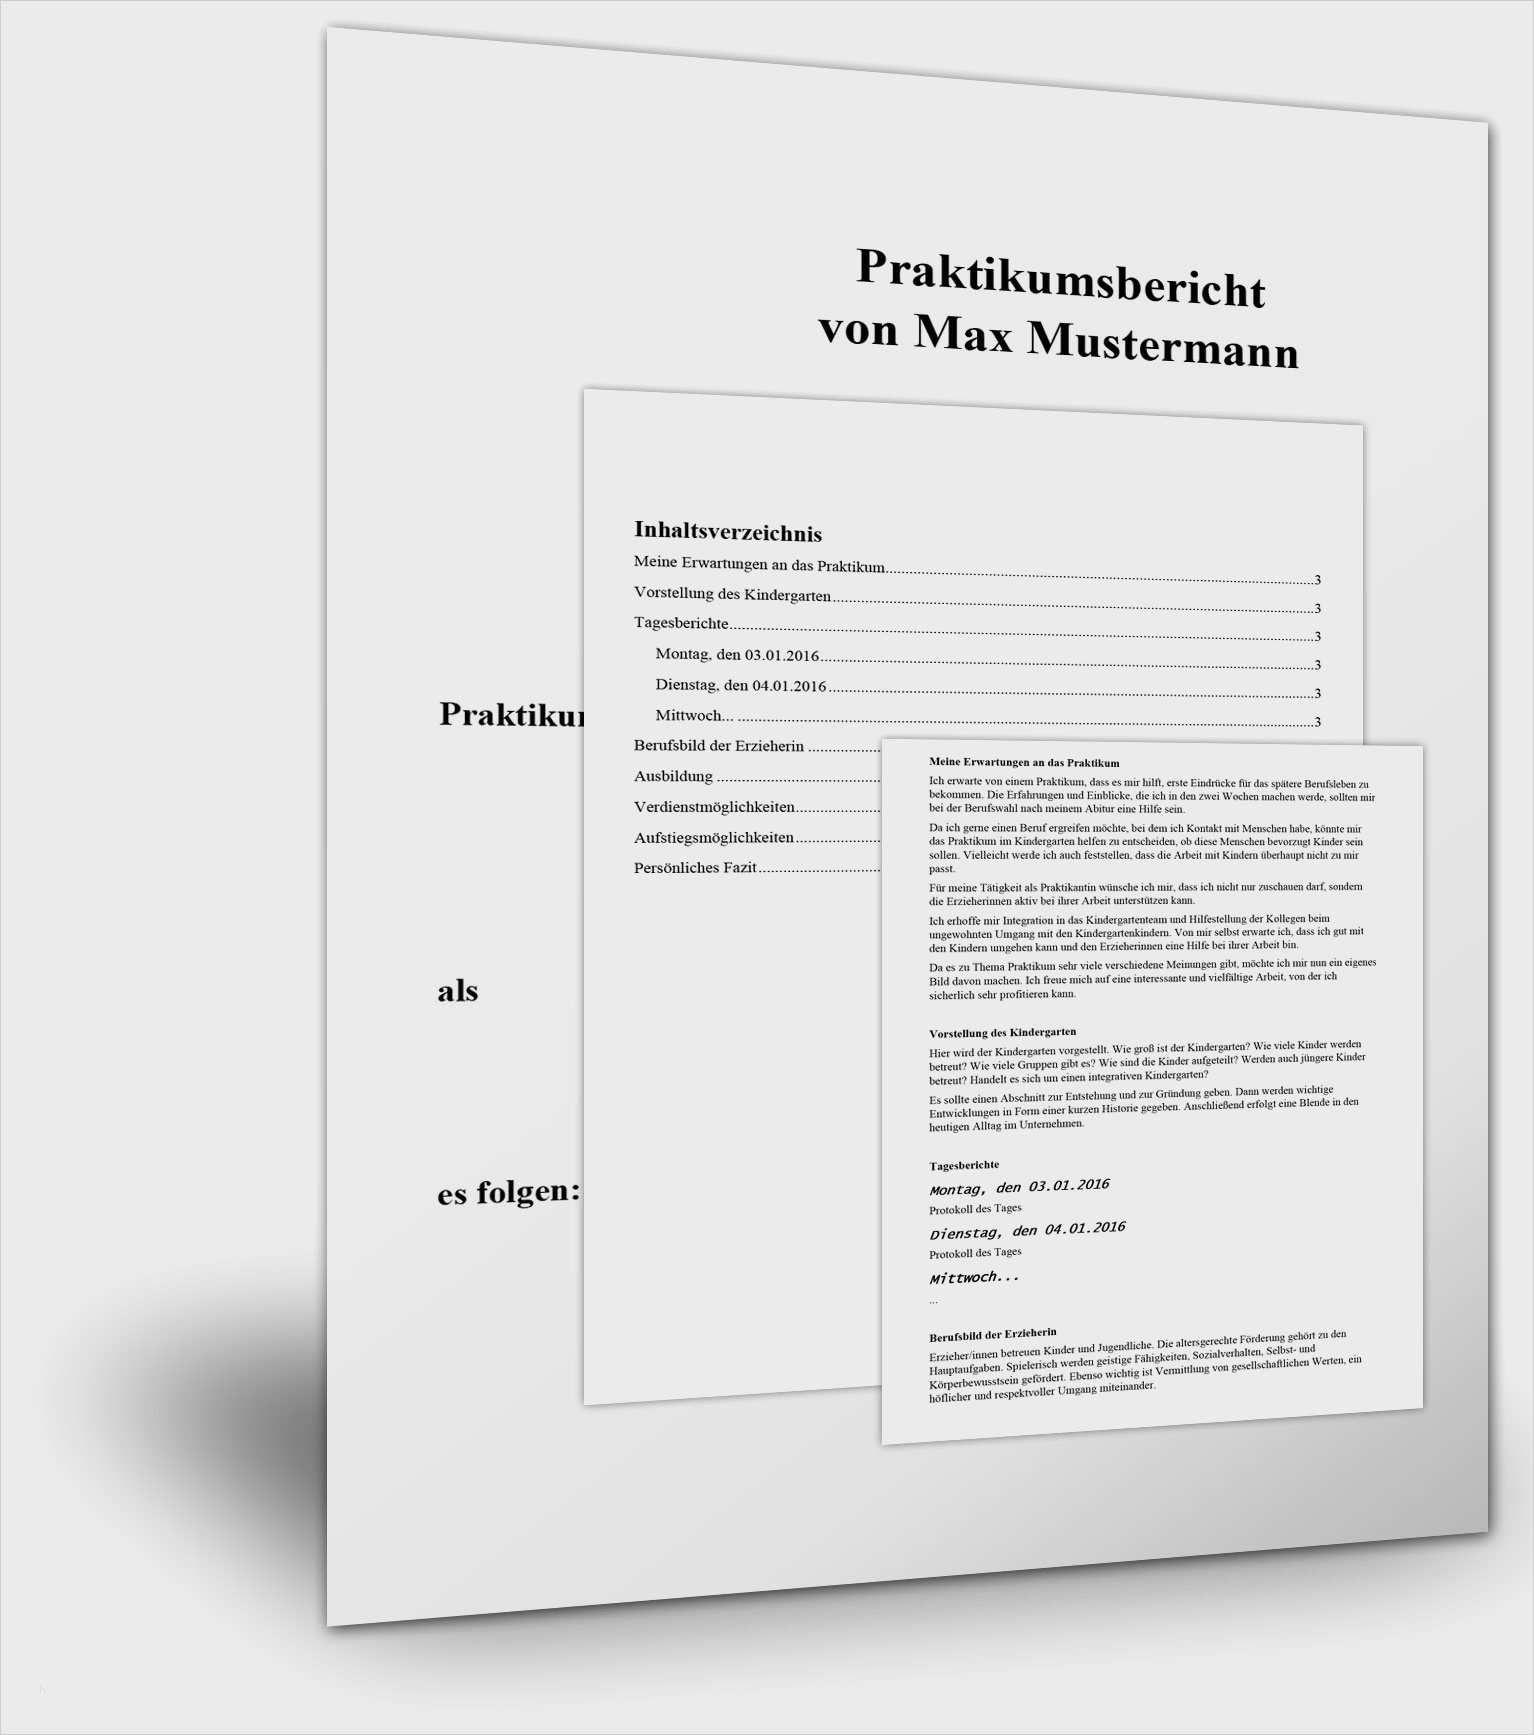 Grossartig Praktikumsbericht Vorlage Pdf 10